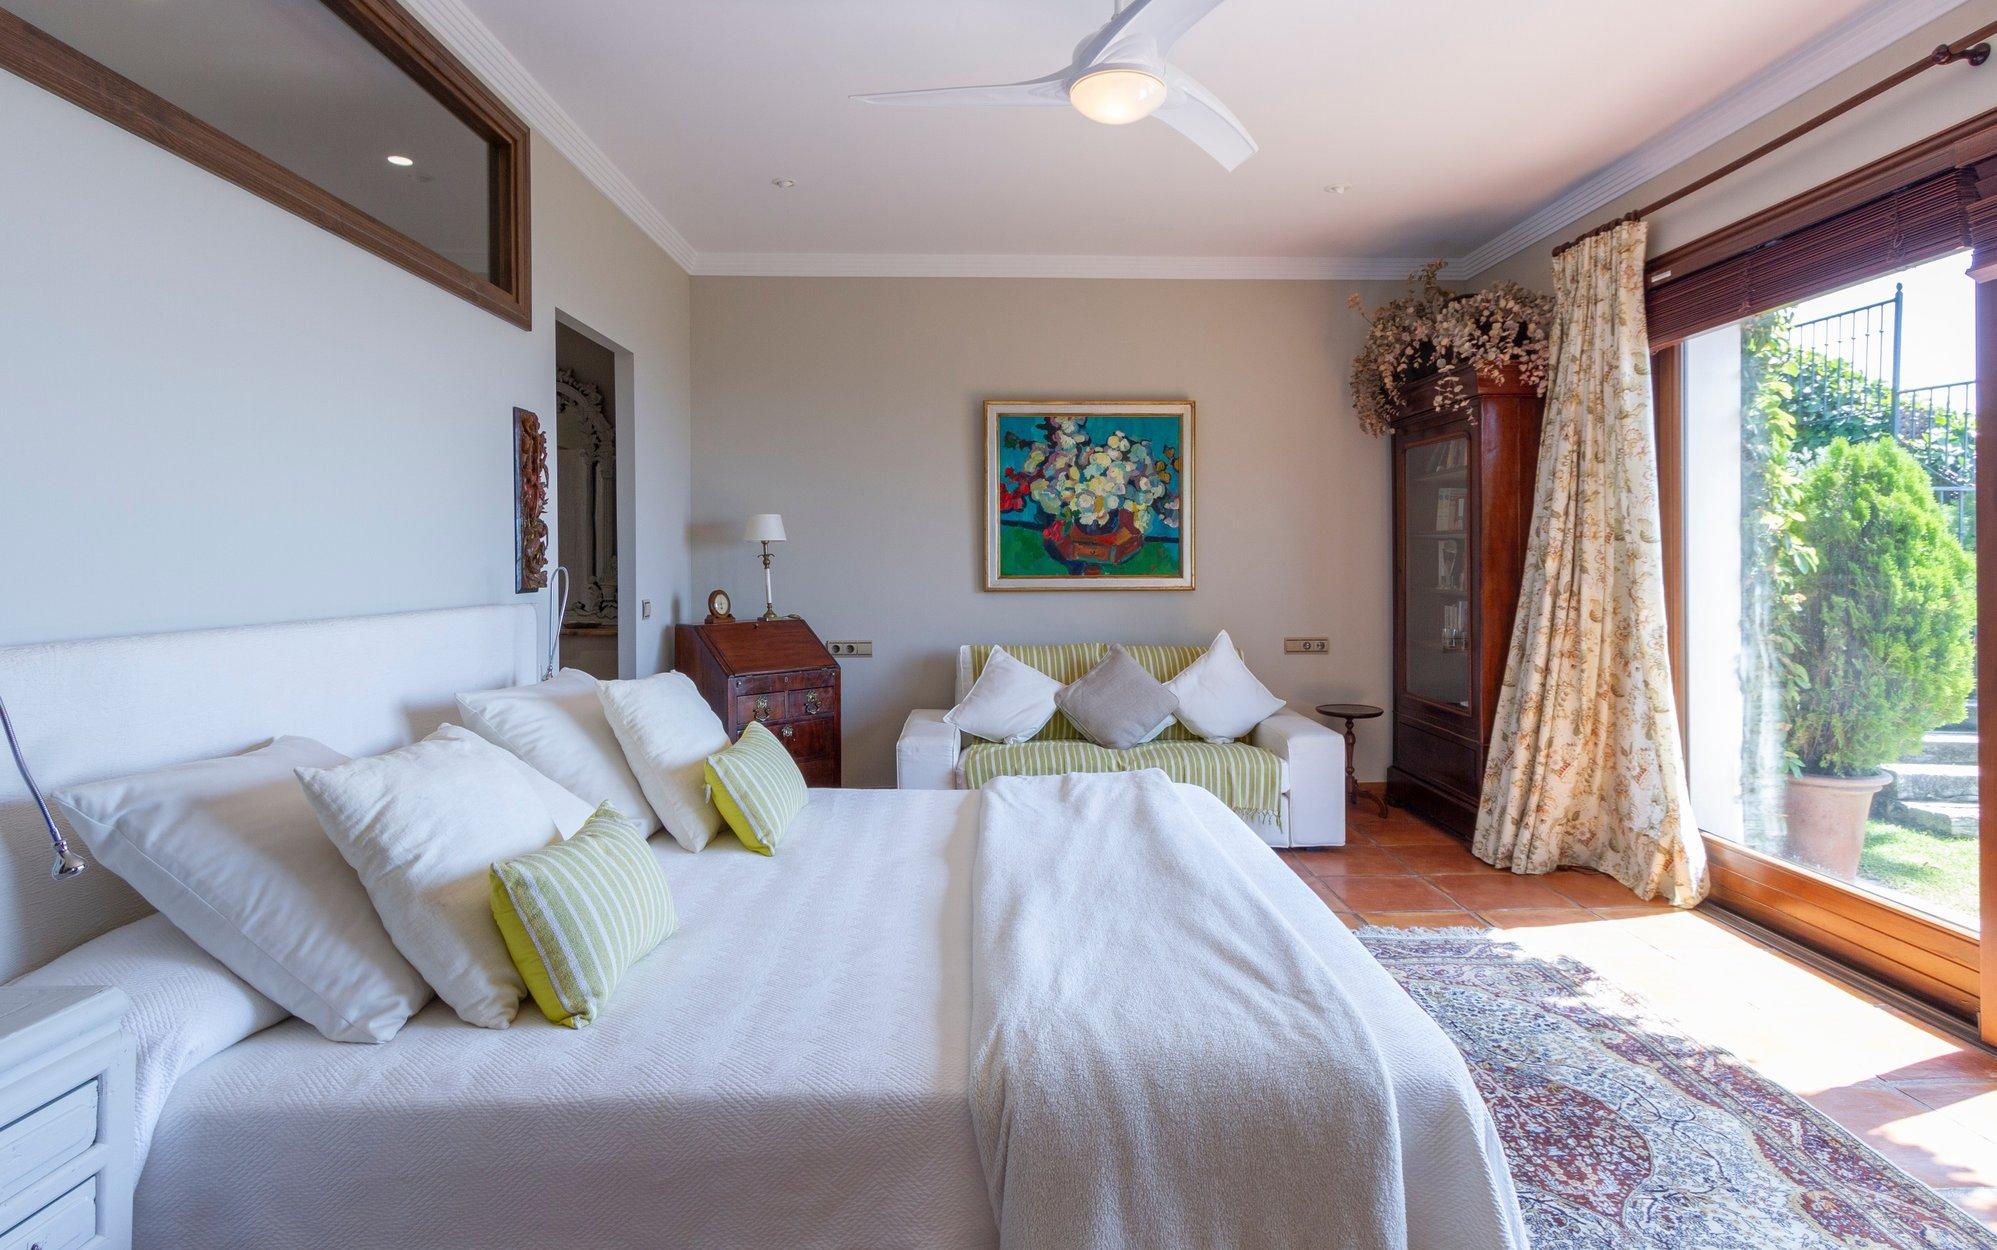 8 Bedroom 8 Bathroom Villa For Sale In La Zagaleta Benahavis Mas Property Marbella